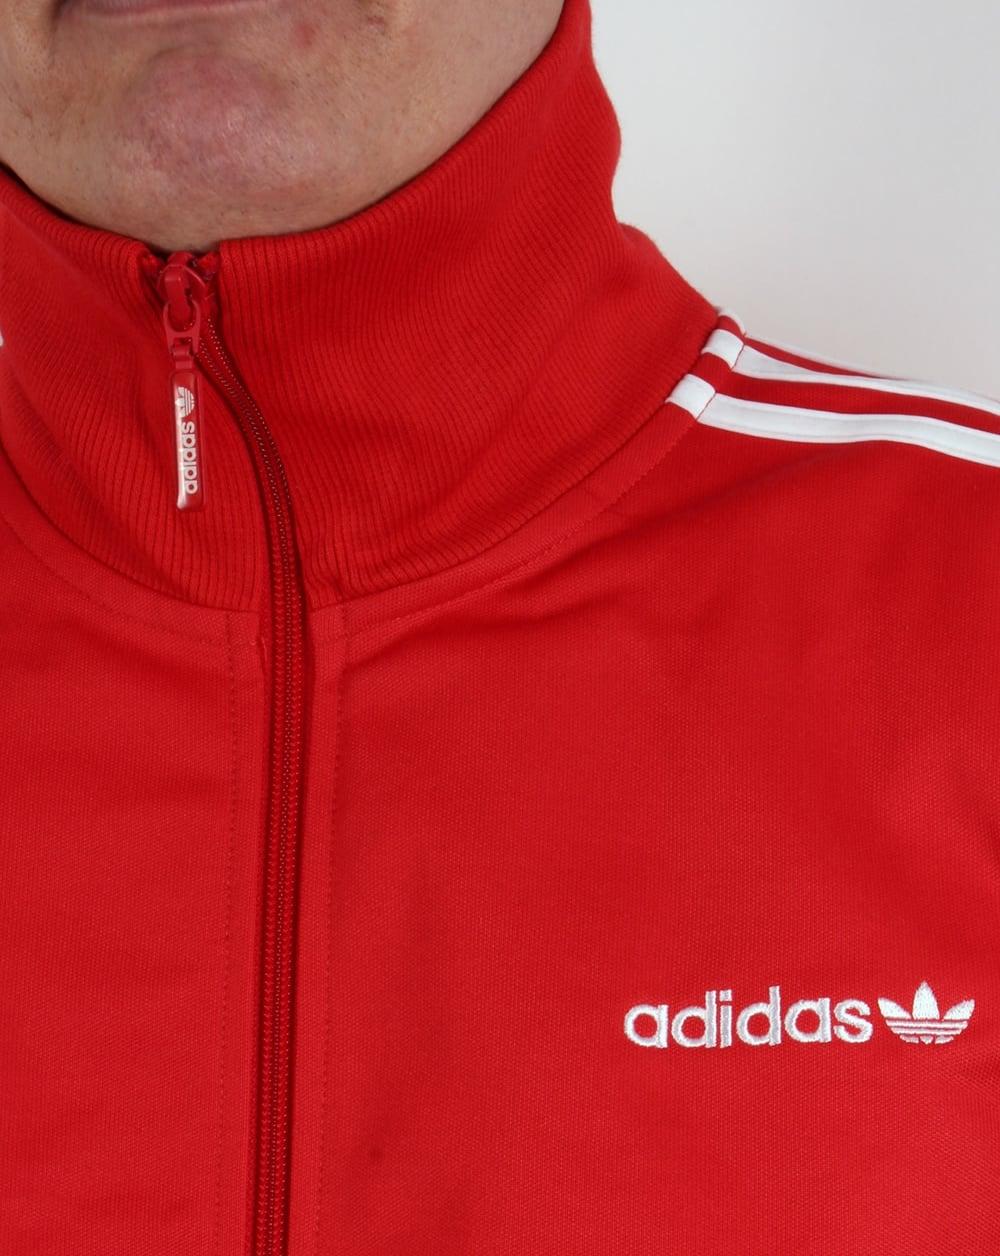 8abf80966620 Adidas Originals Beckenbauer Track Top Red white,tracksuit,jacket